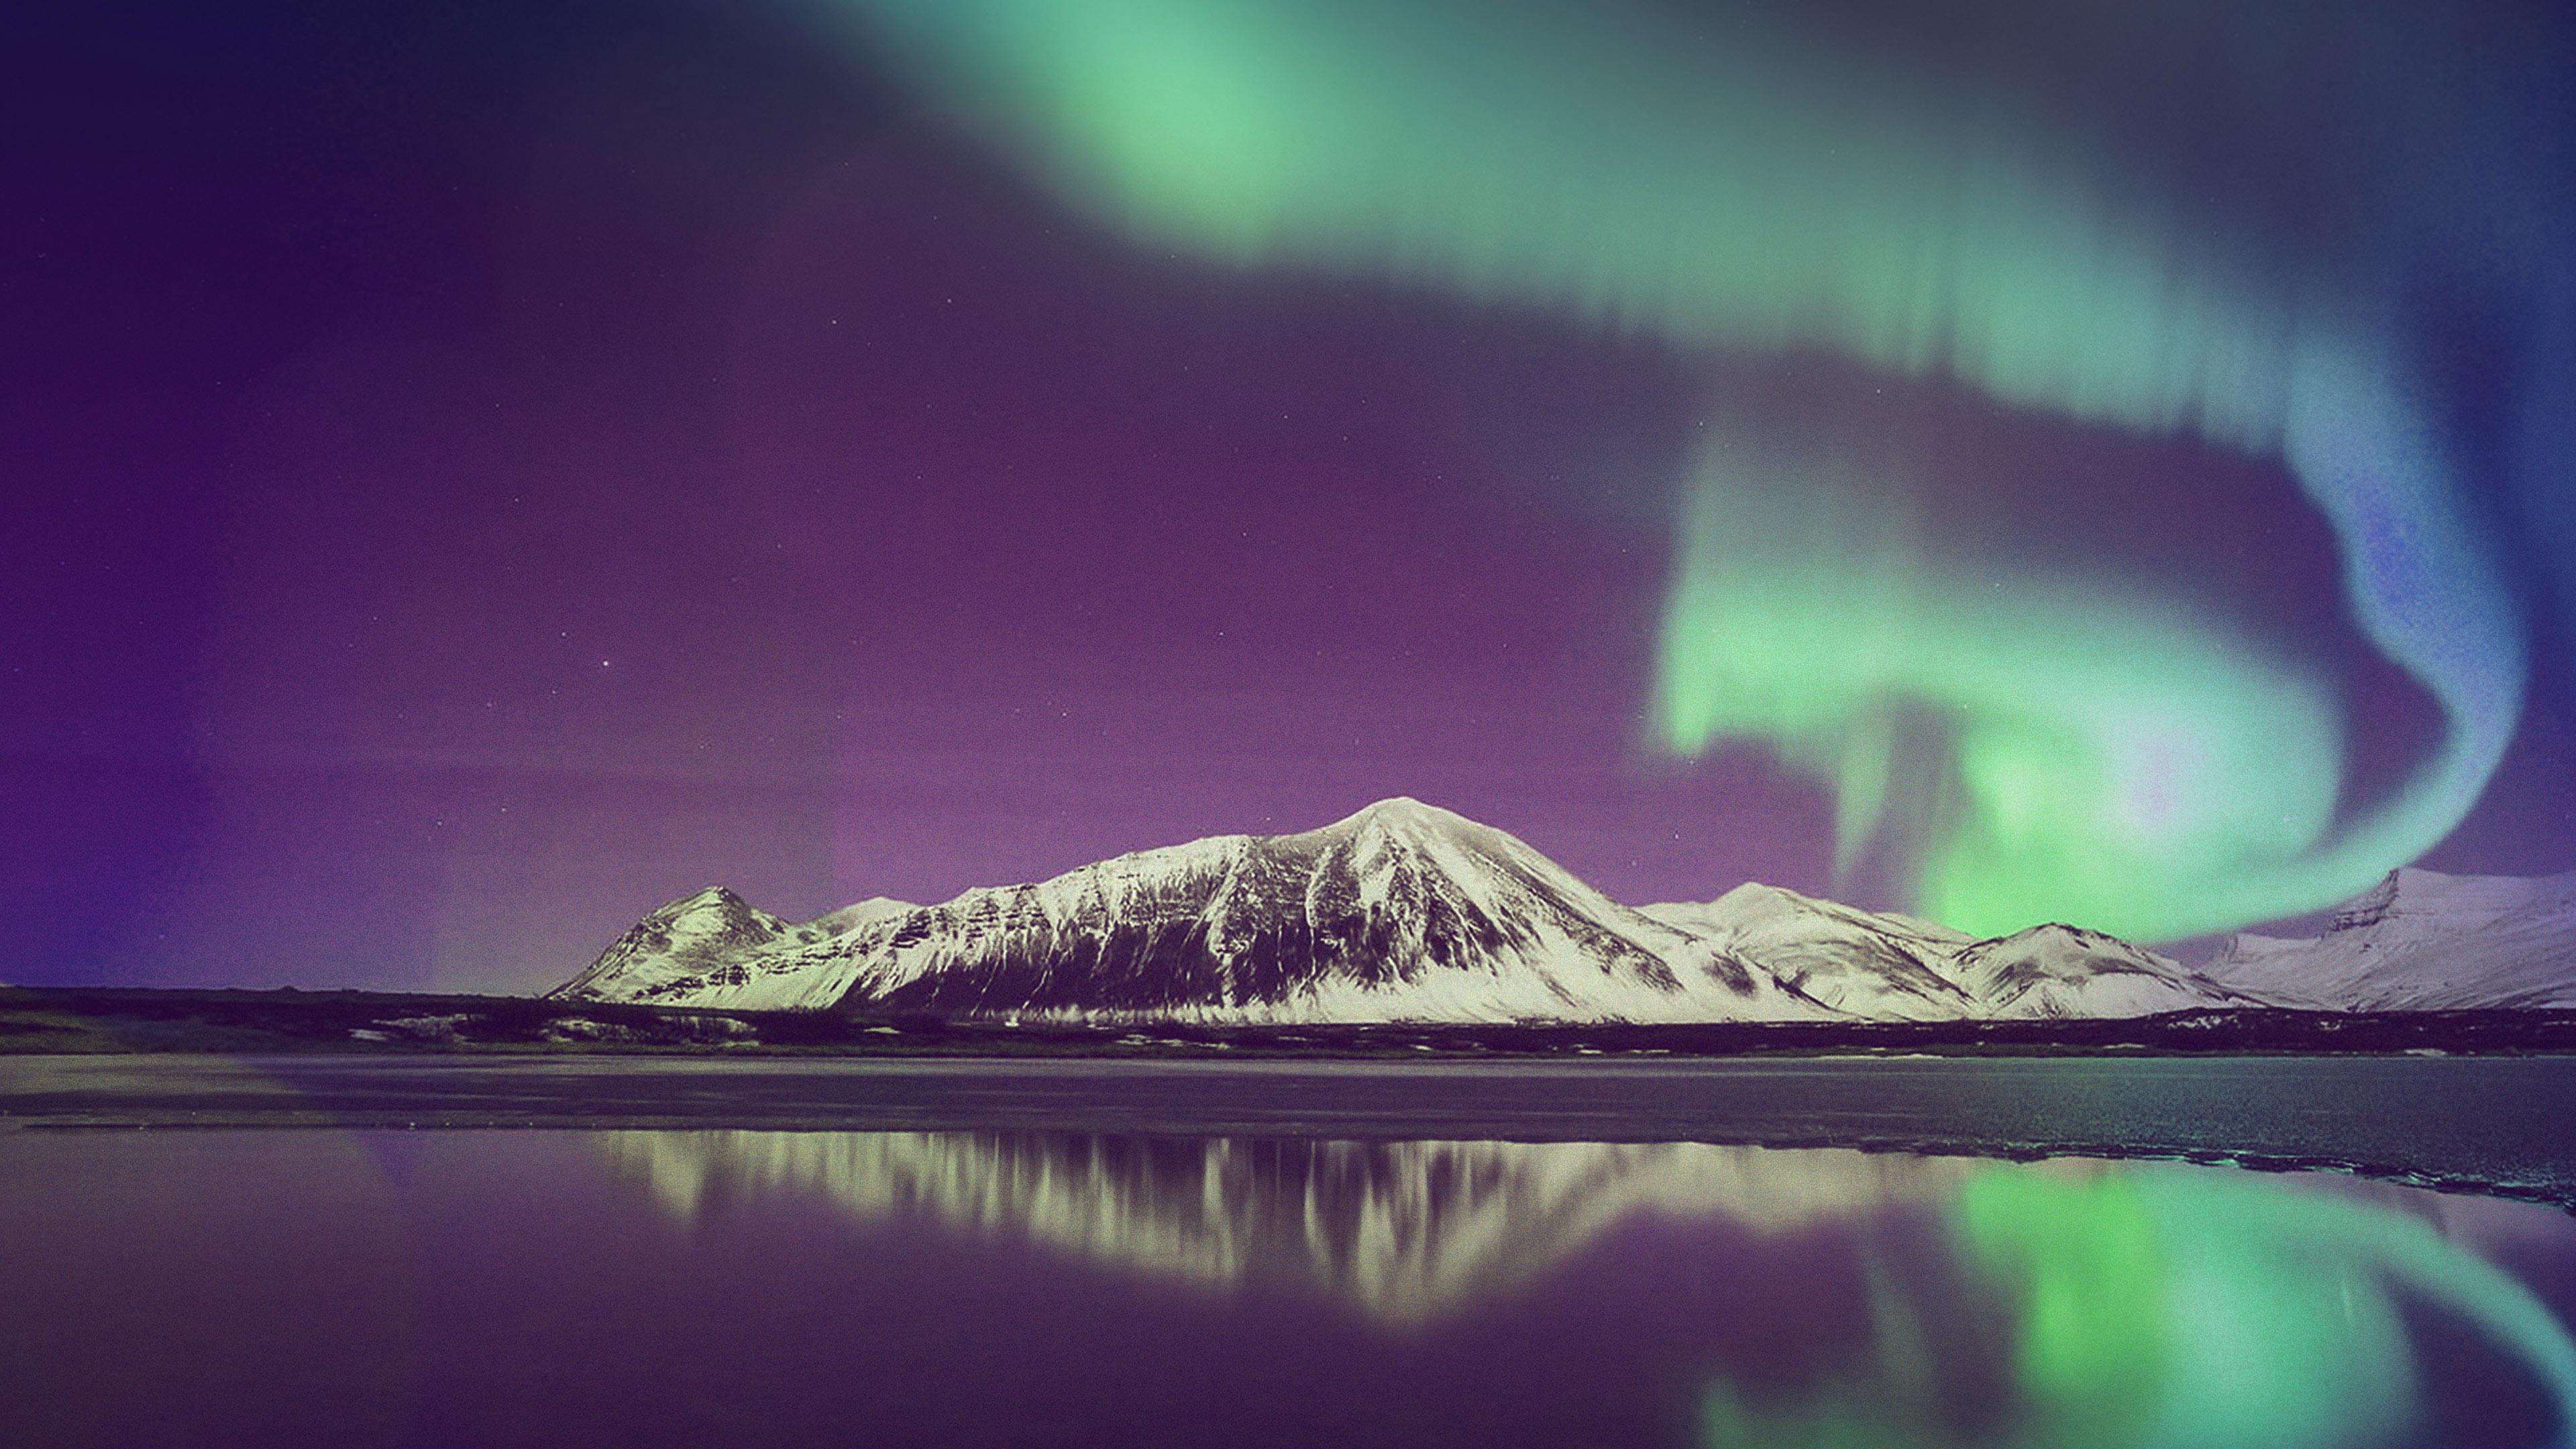 ml94-aurora-night-sky-red-bokeh-instagram-art-nature-wallpaper